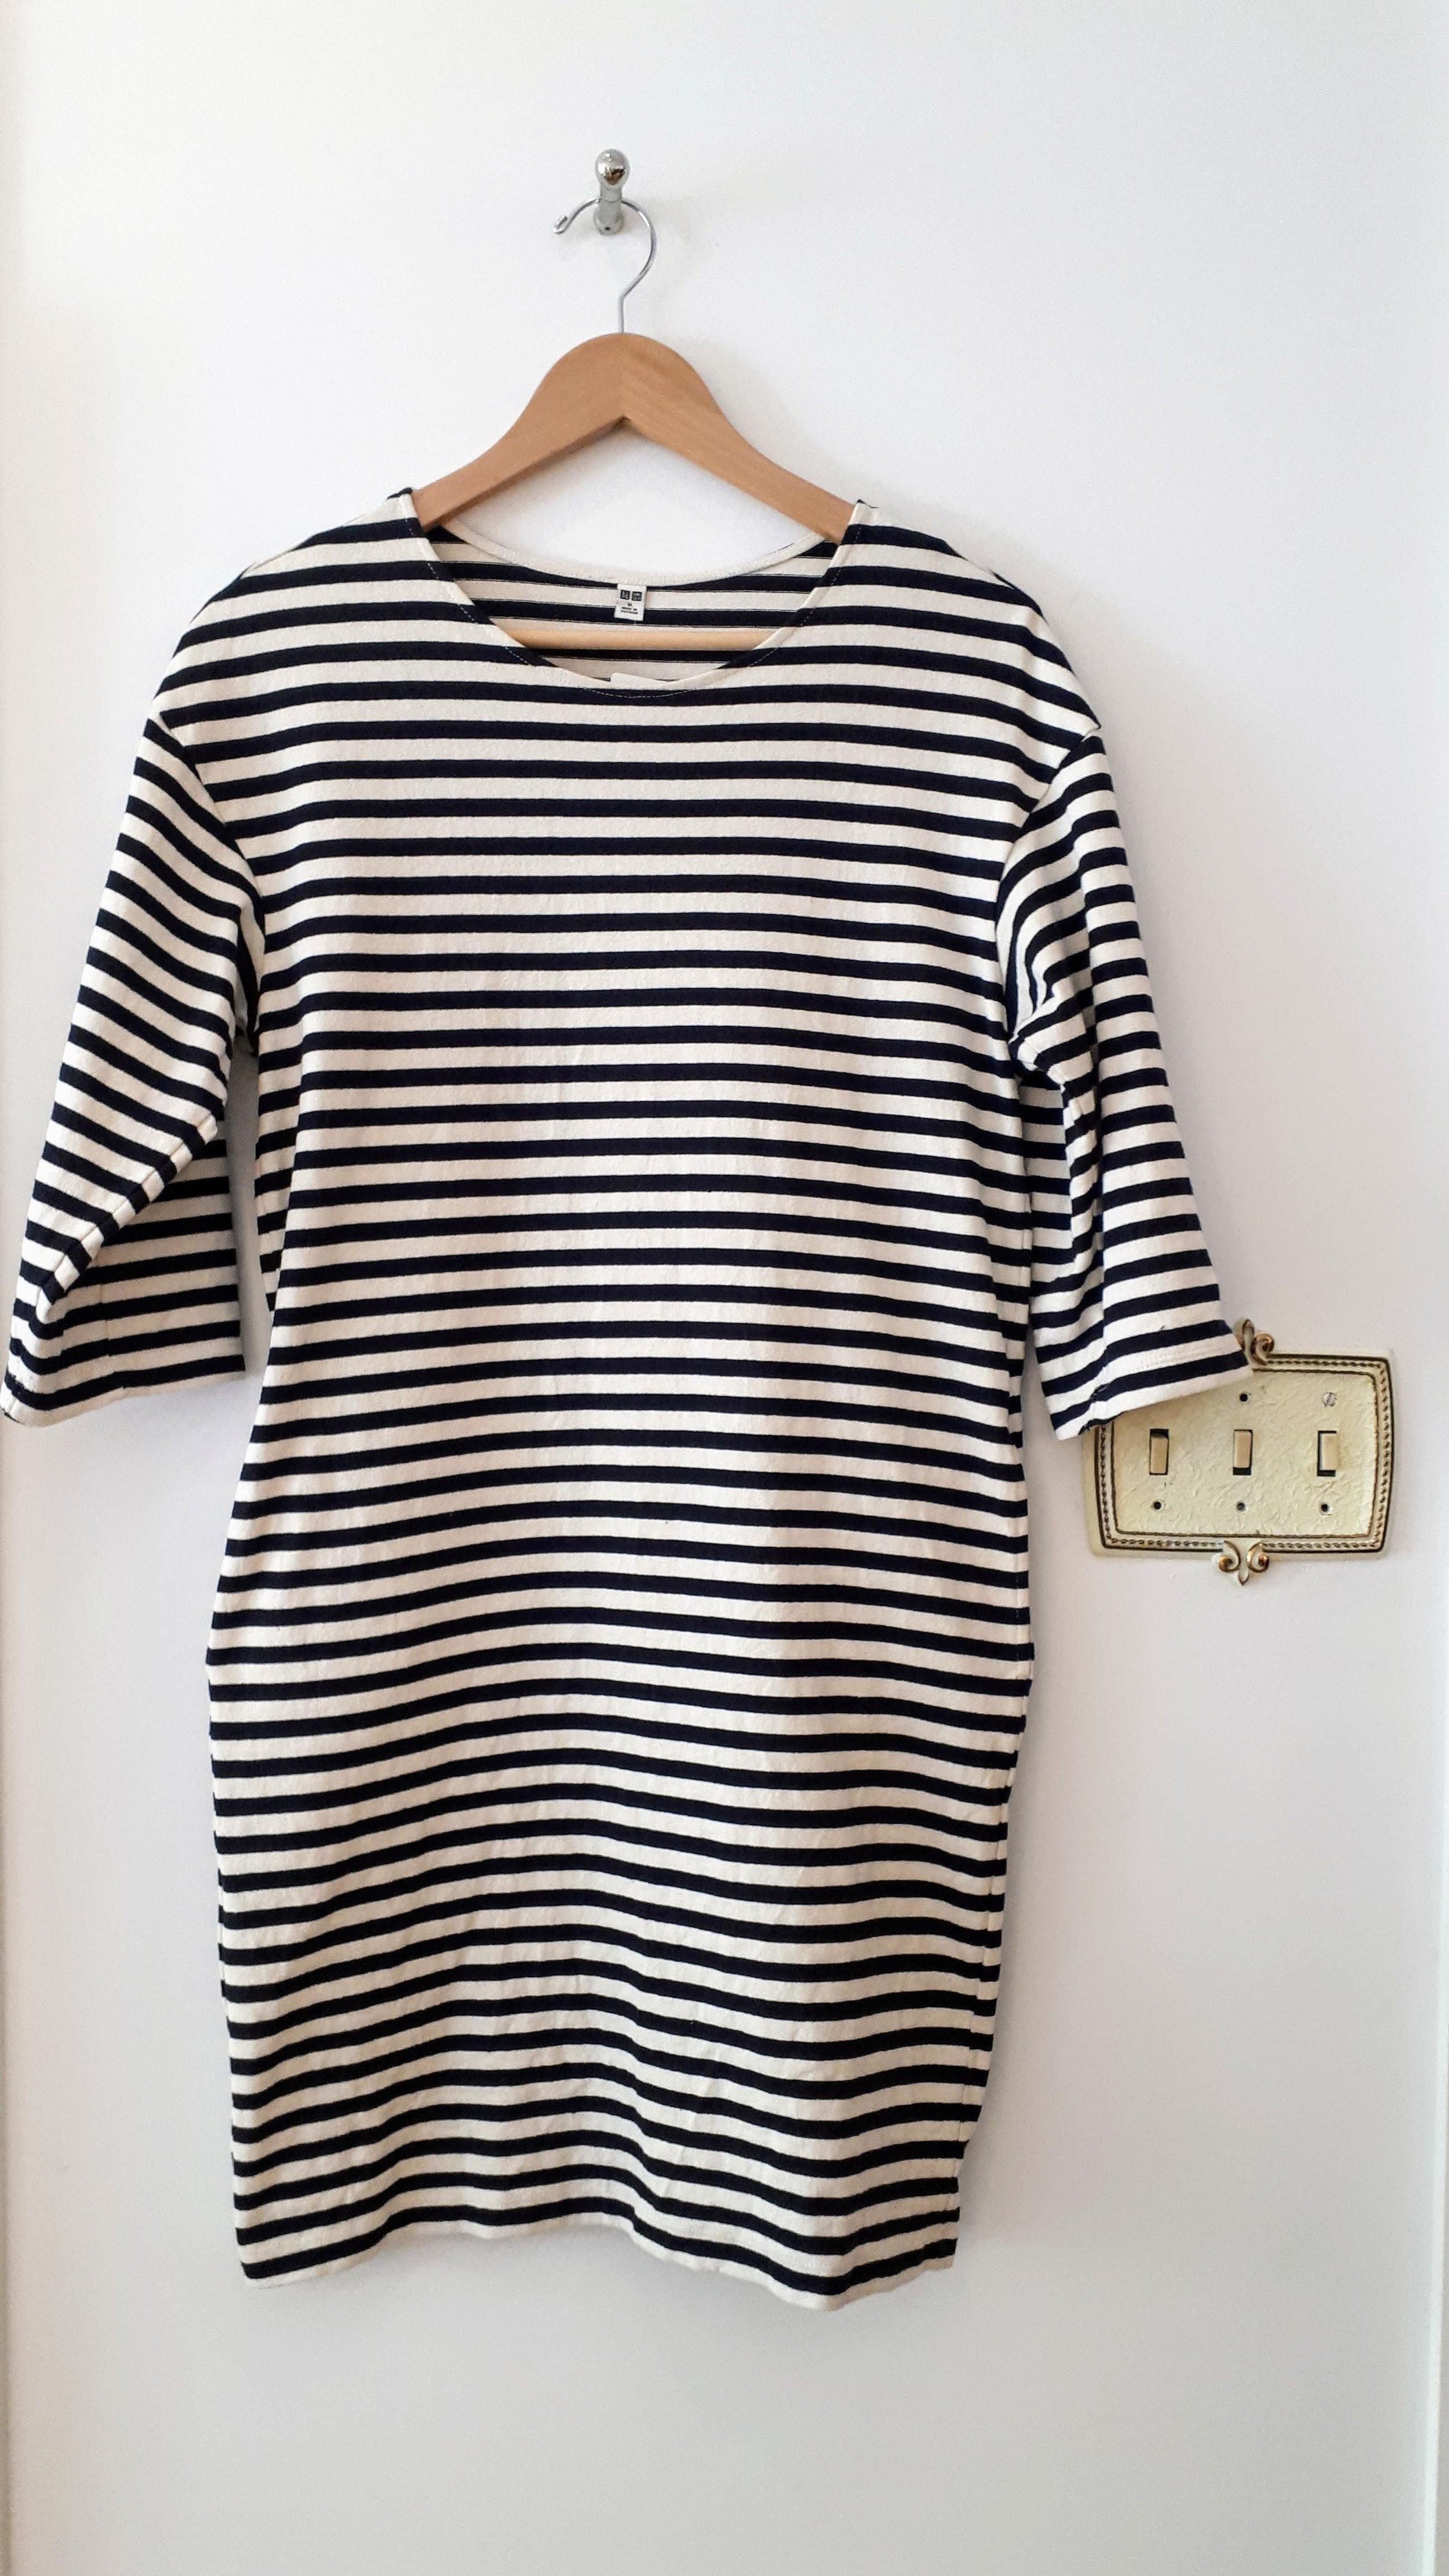 Uniqlo dress; Size M, $28